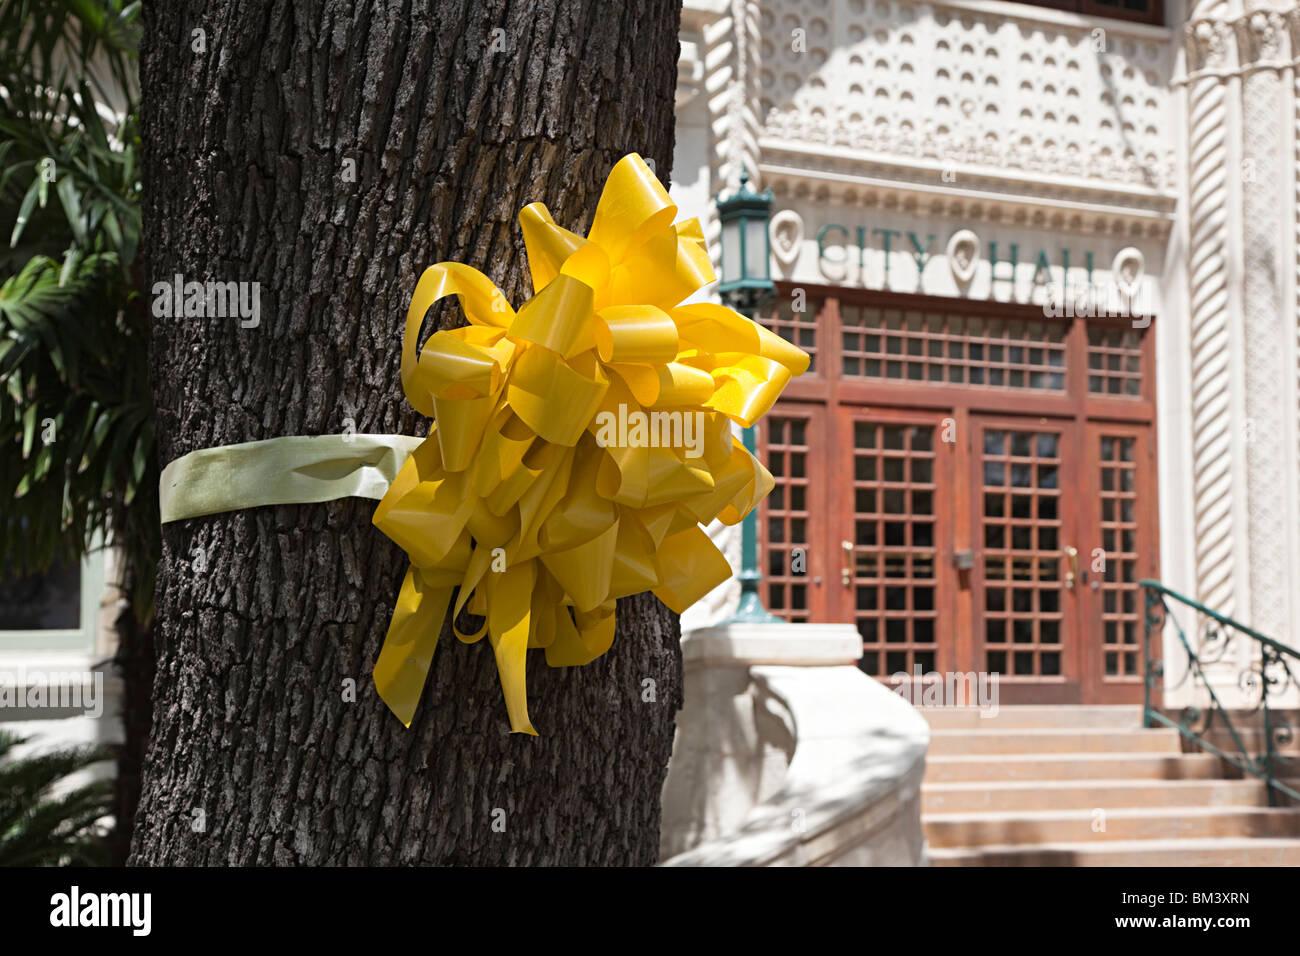 Yellow ribbon tied round tree outside city hall San Antonio Texas USA - Stock Image